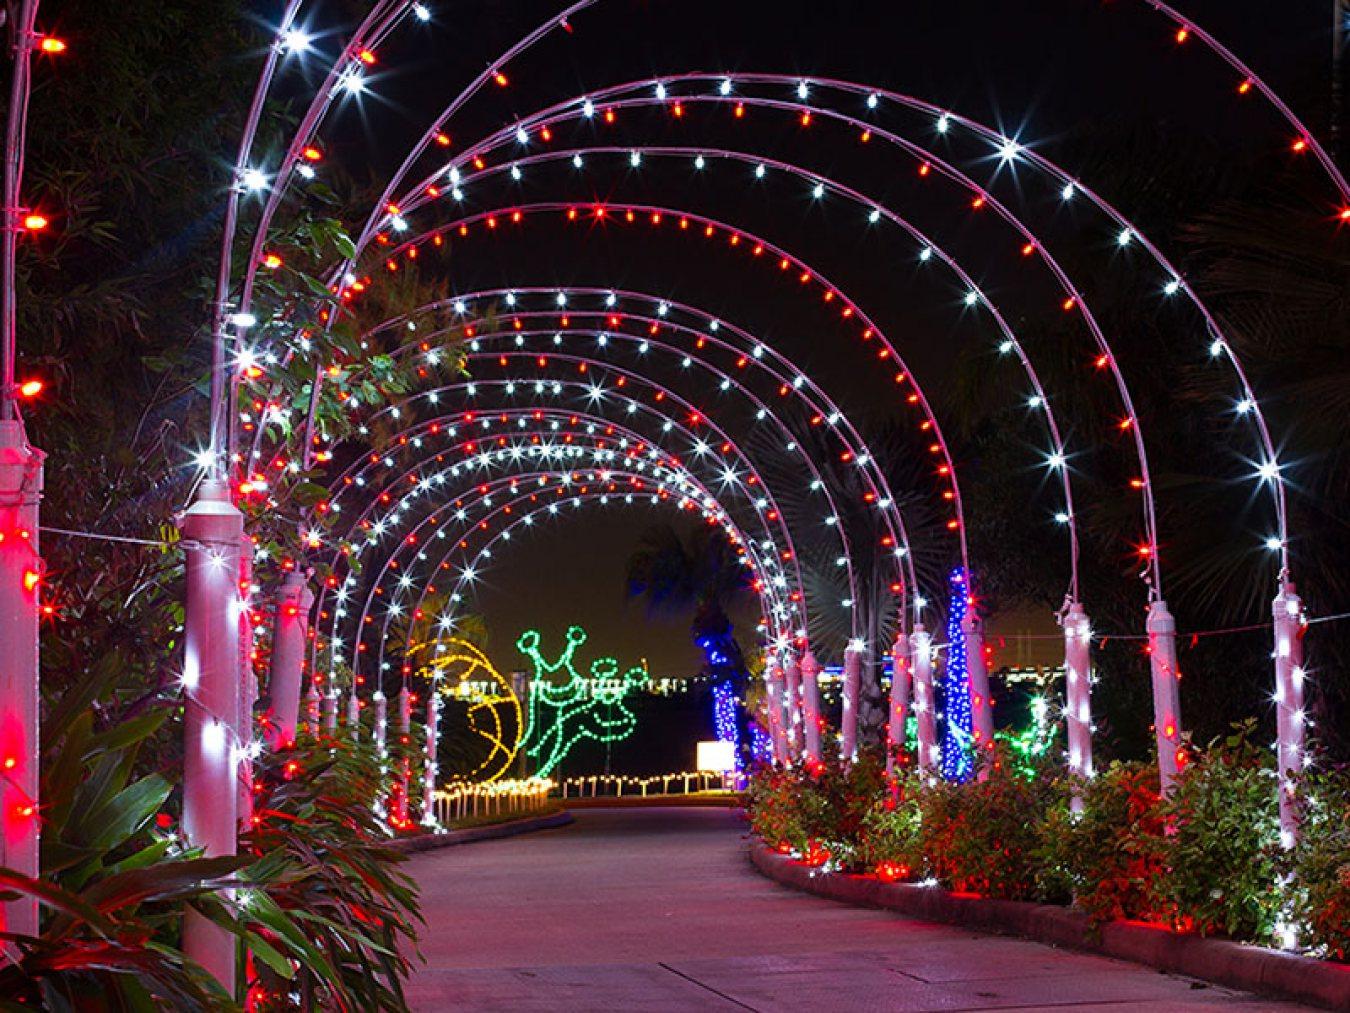 Festival of Lights Tunnel